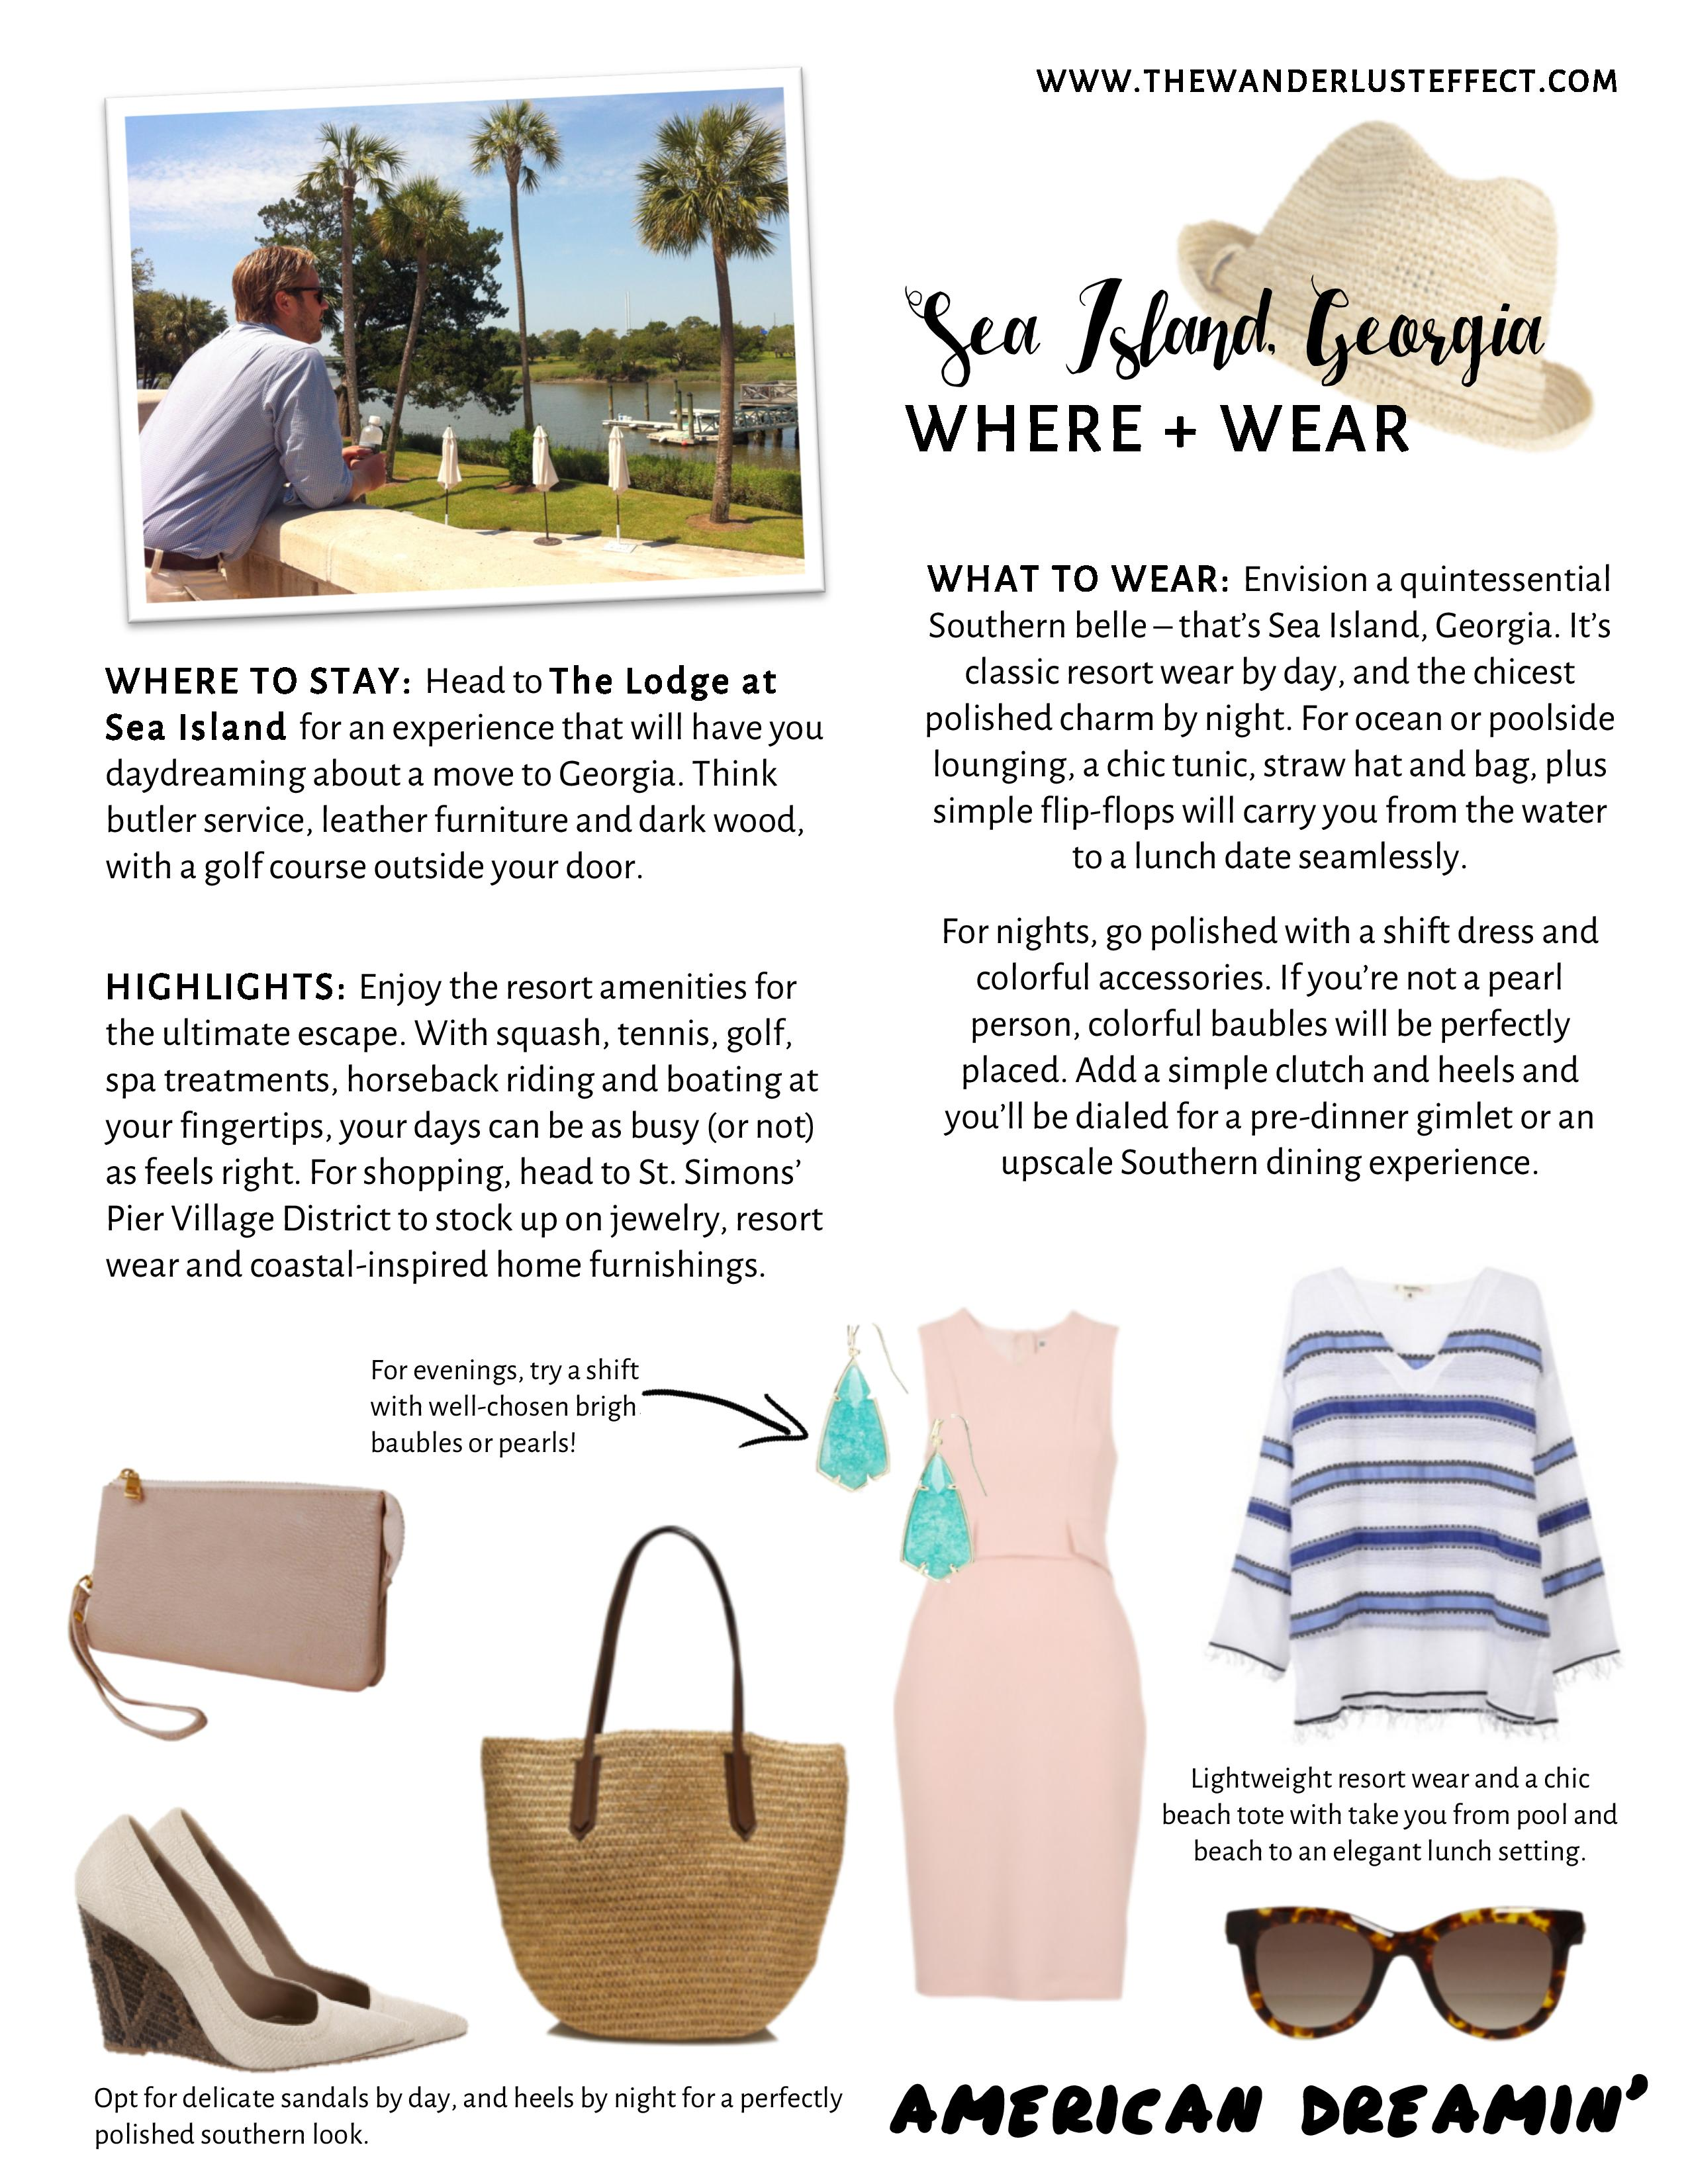 What to Wear Sea Island Georgia